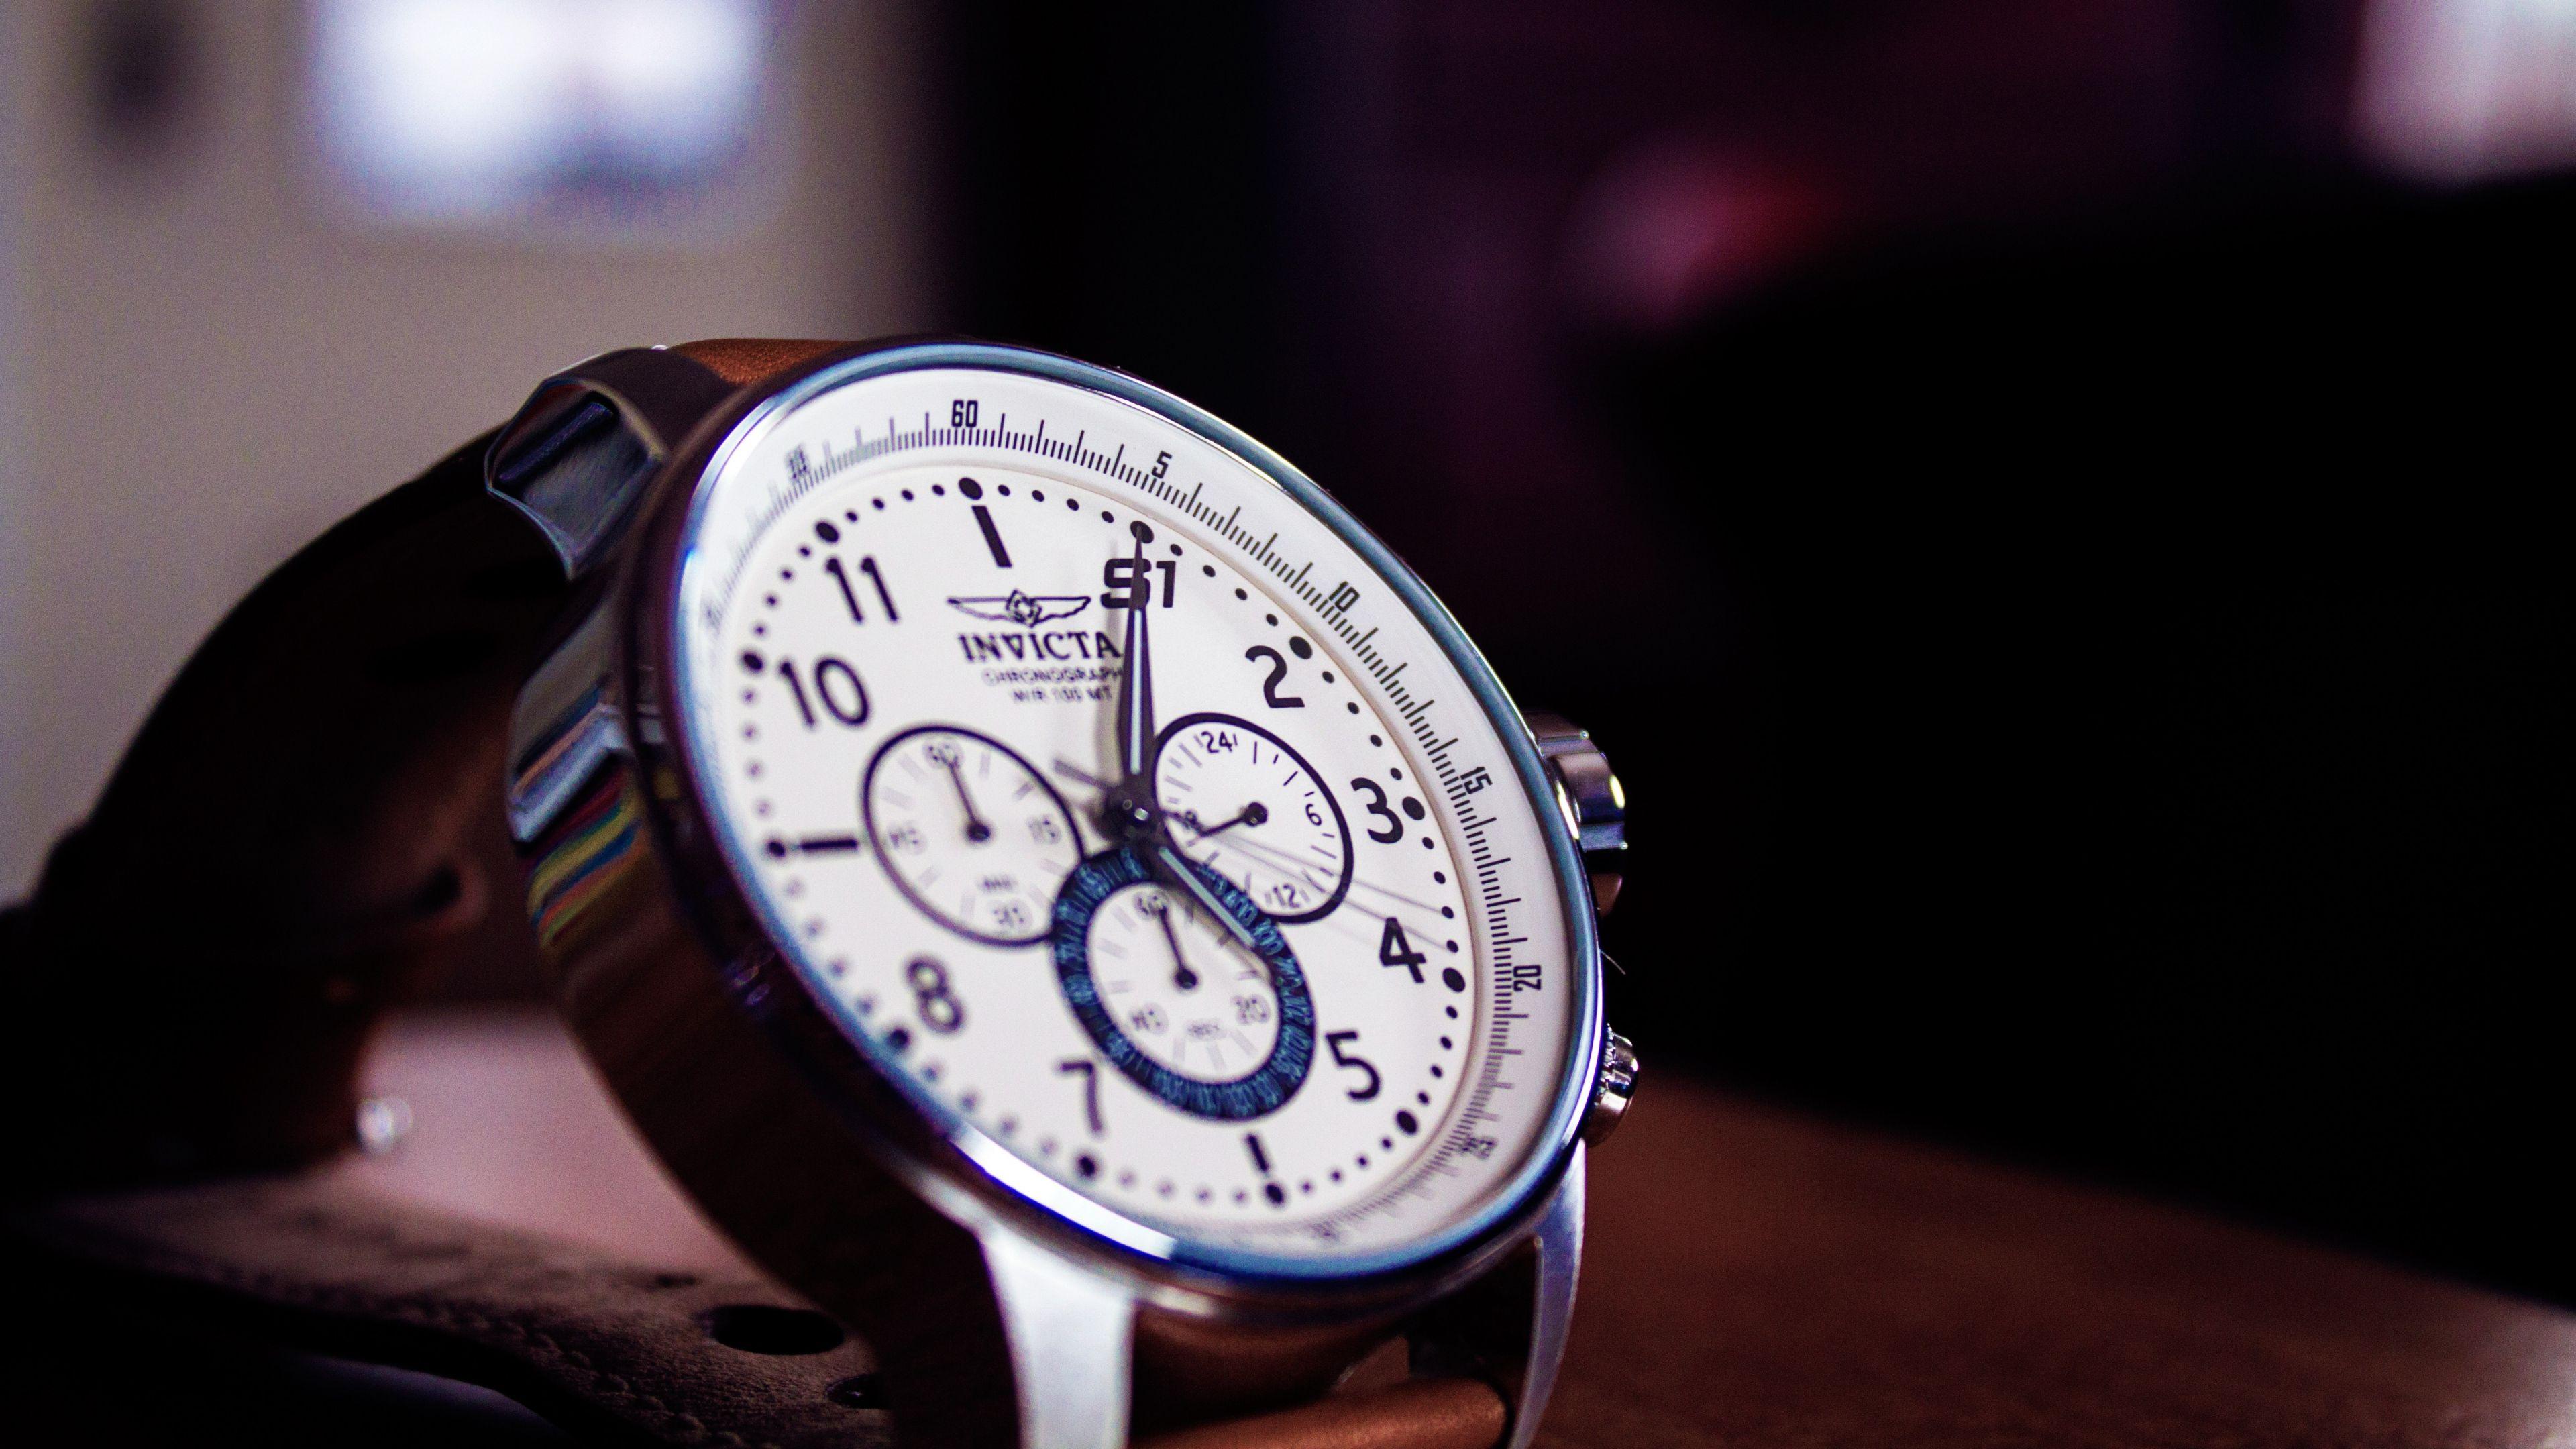 3840x2160 Wallpaper invicta, watches, dial, status